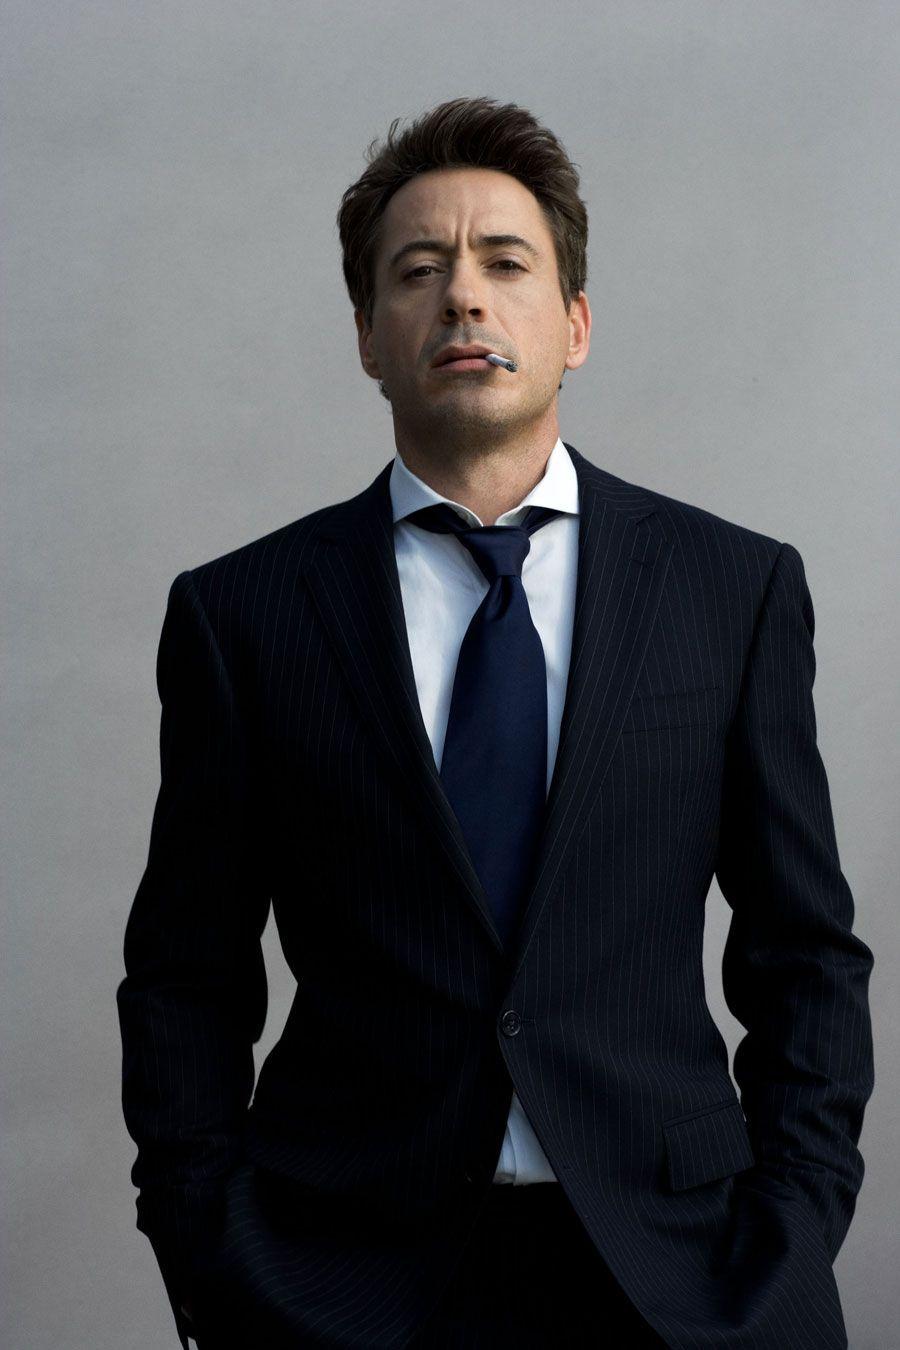 Robert Downey Jr Wallpapers Free Wallpaper 1279 800 Robert Downey